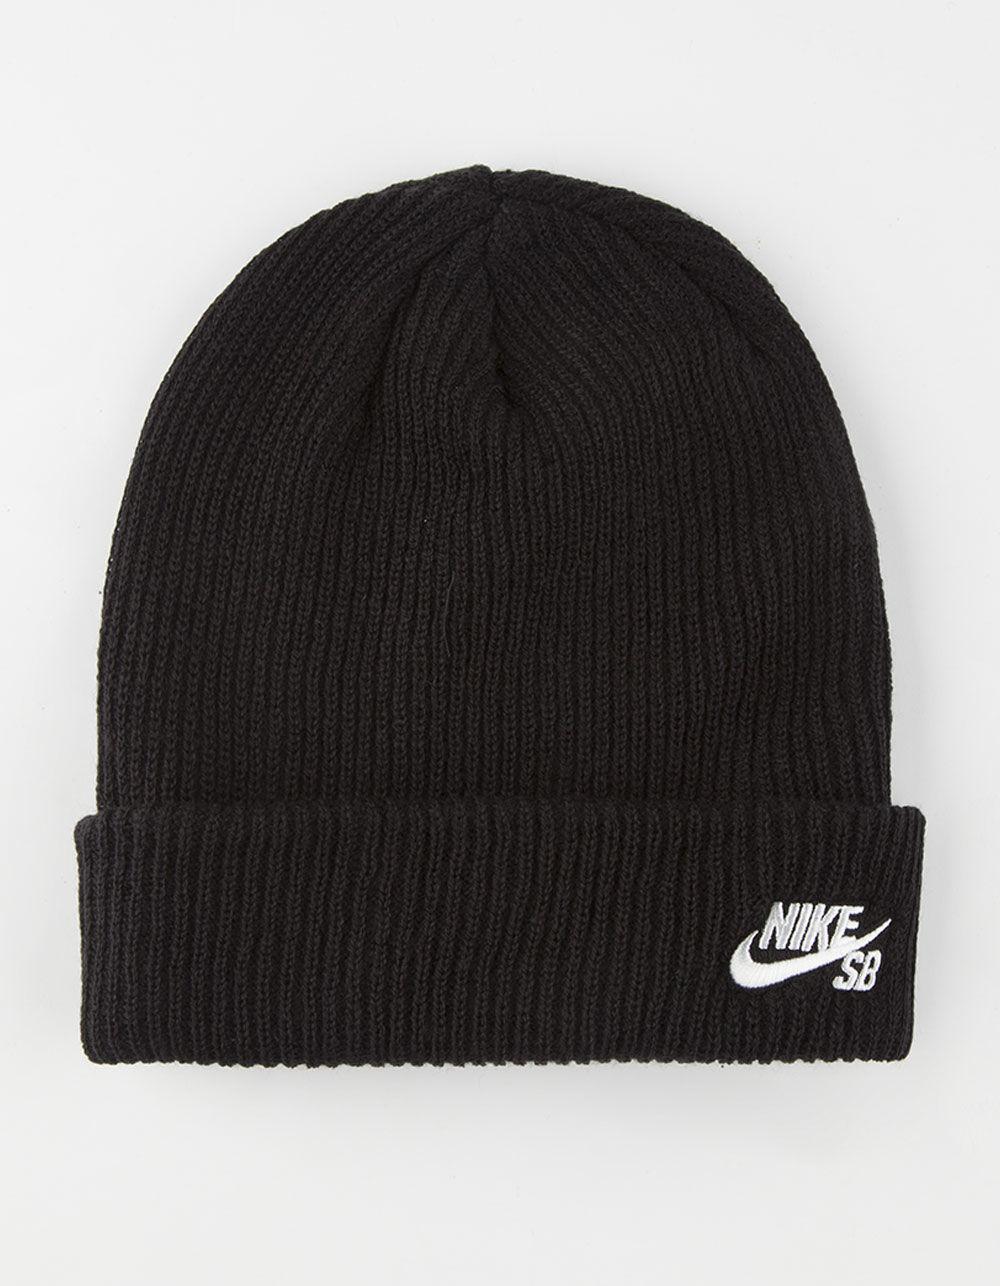 735765ec3ed5 Lyst - Nike Fisherman Beanie in Black for Men - Save 29%